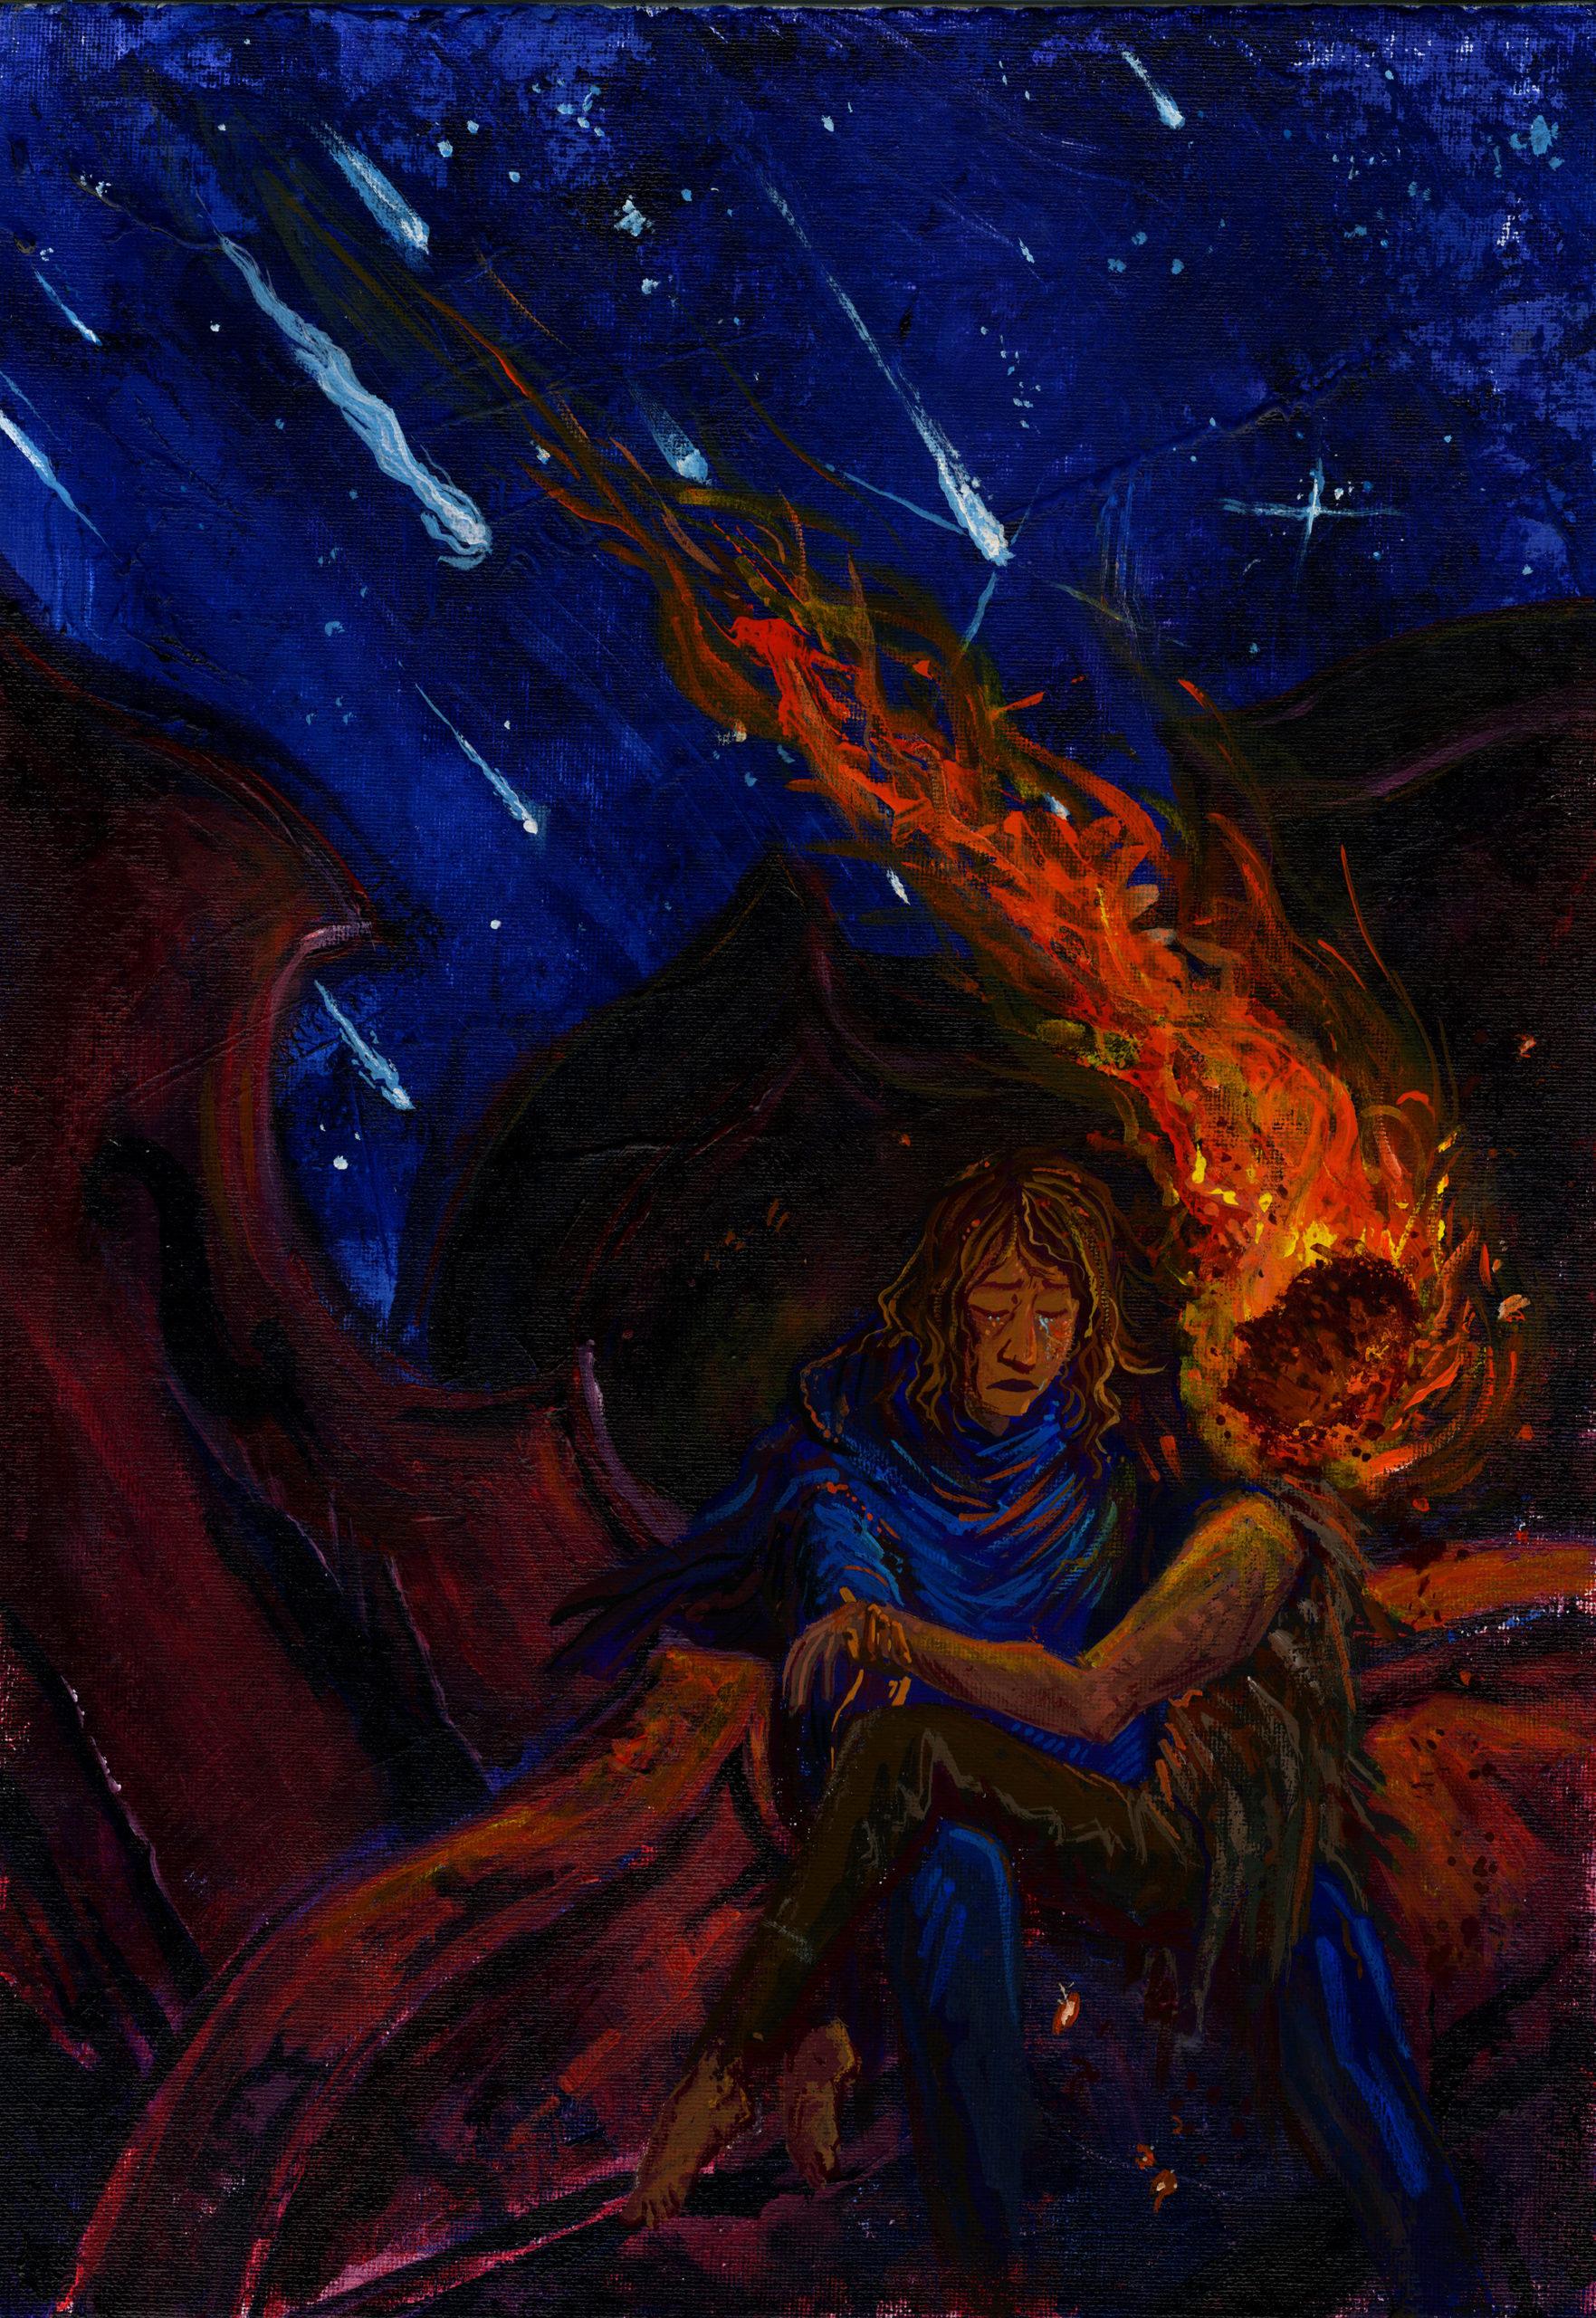 Hercules student artwork from MassArt, Gerstmyer